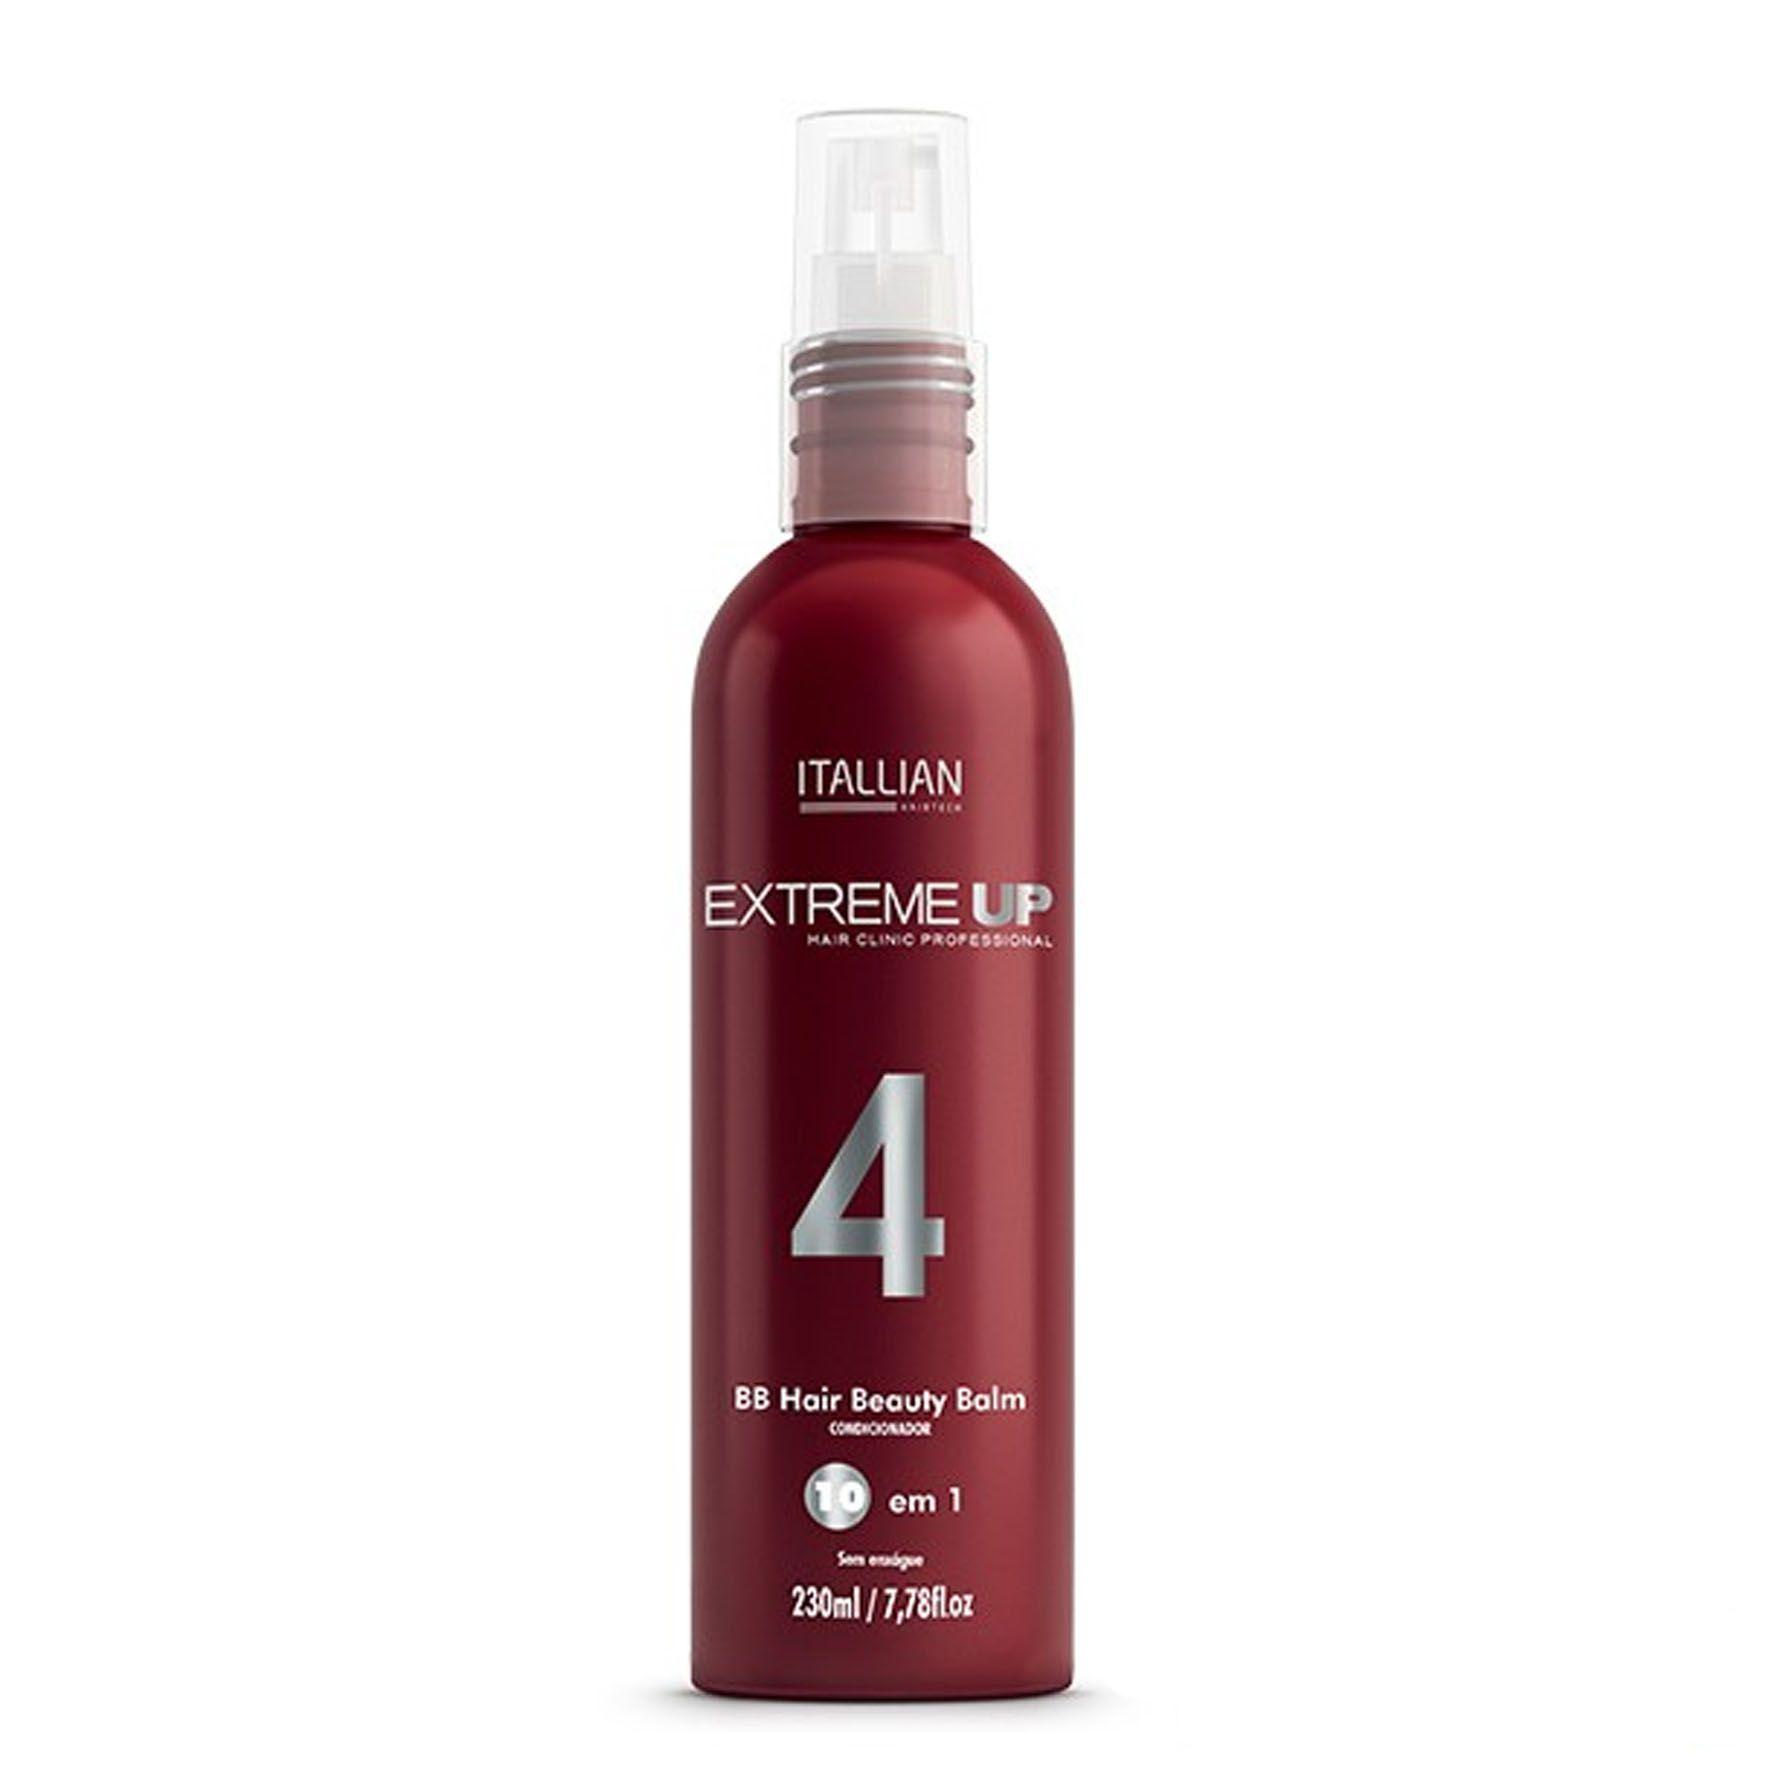 Itallian BB Hair Beauty Balm Extreme UP 4 - 230ml